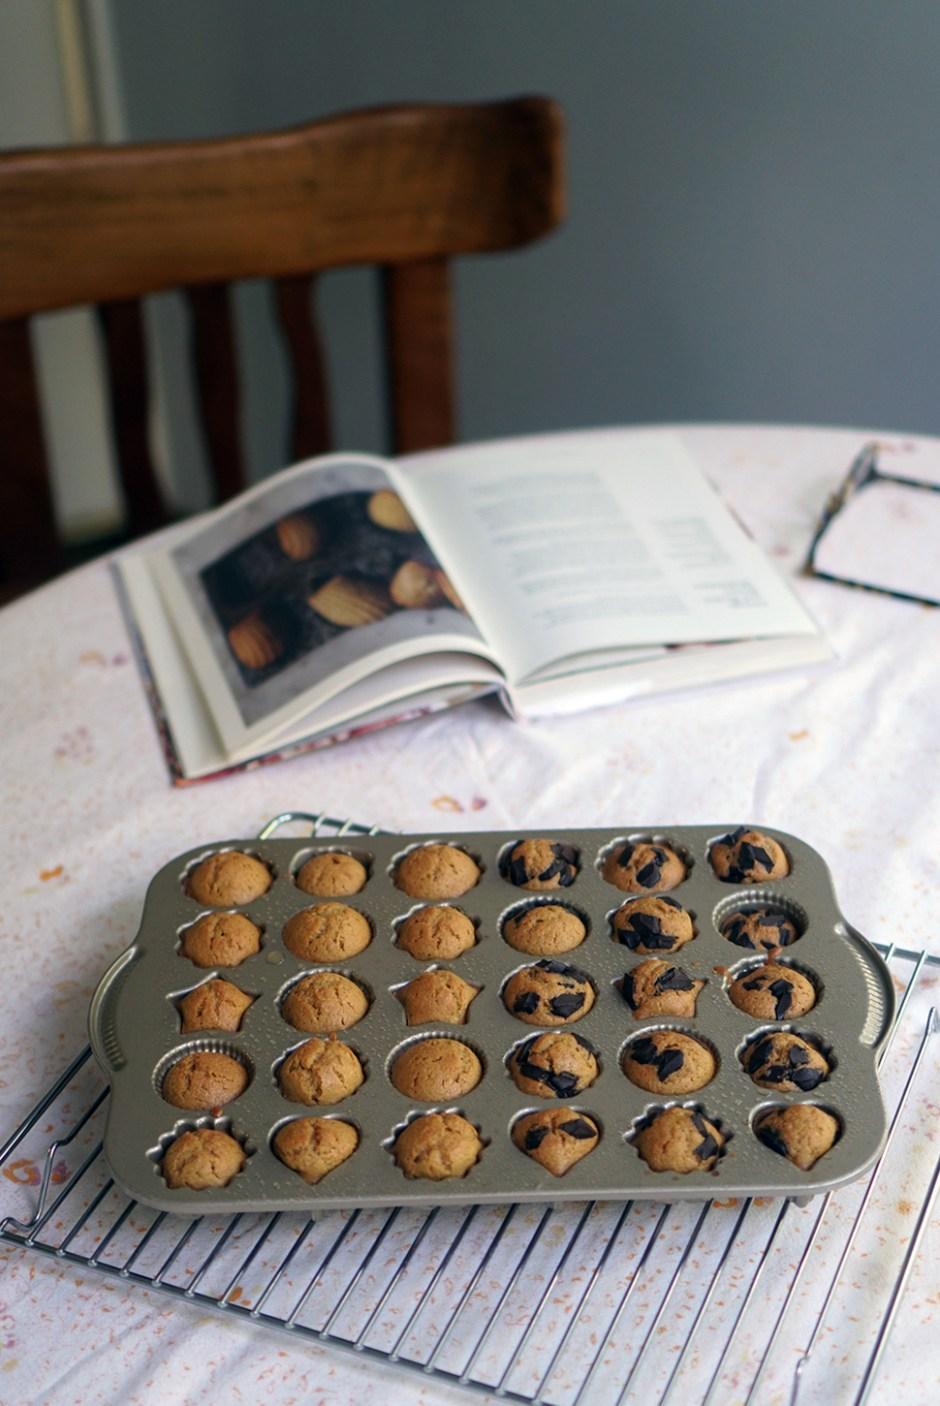 Orange & chocolate madeleines